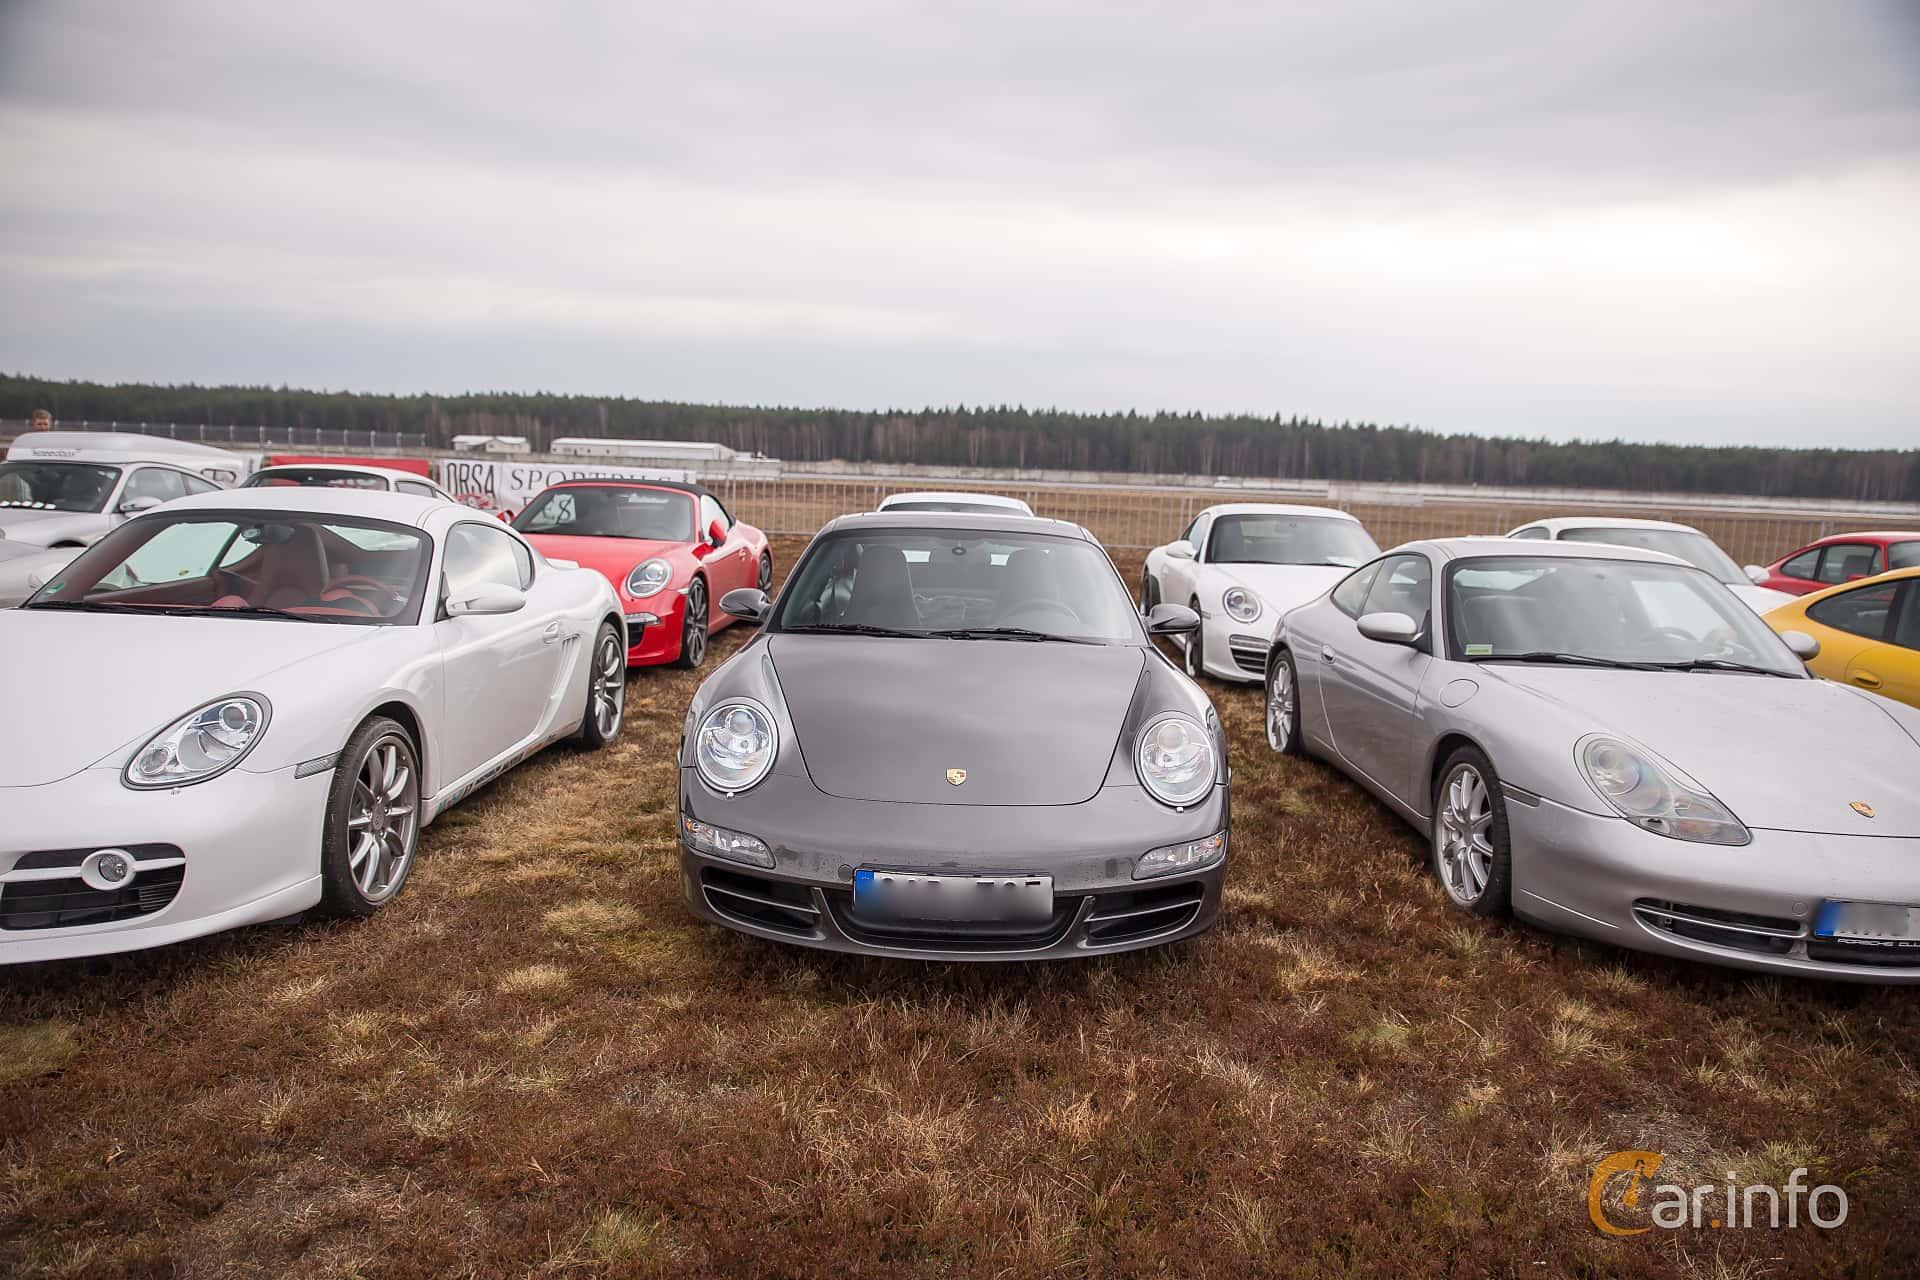 Porsche 911 Carrera 4S 3.8 H6 4 Manual, 355hp, 2008 at Skövde Sportbilsfestival 2016